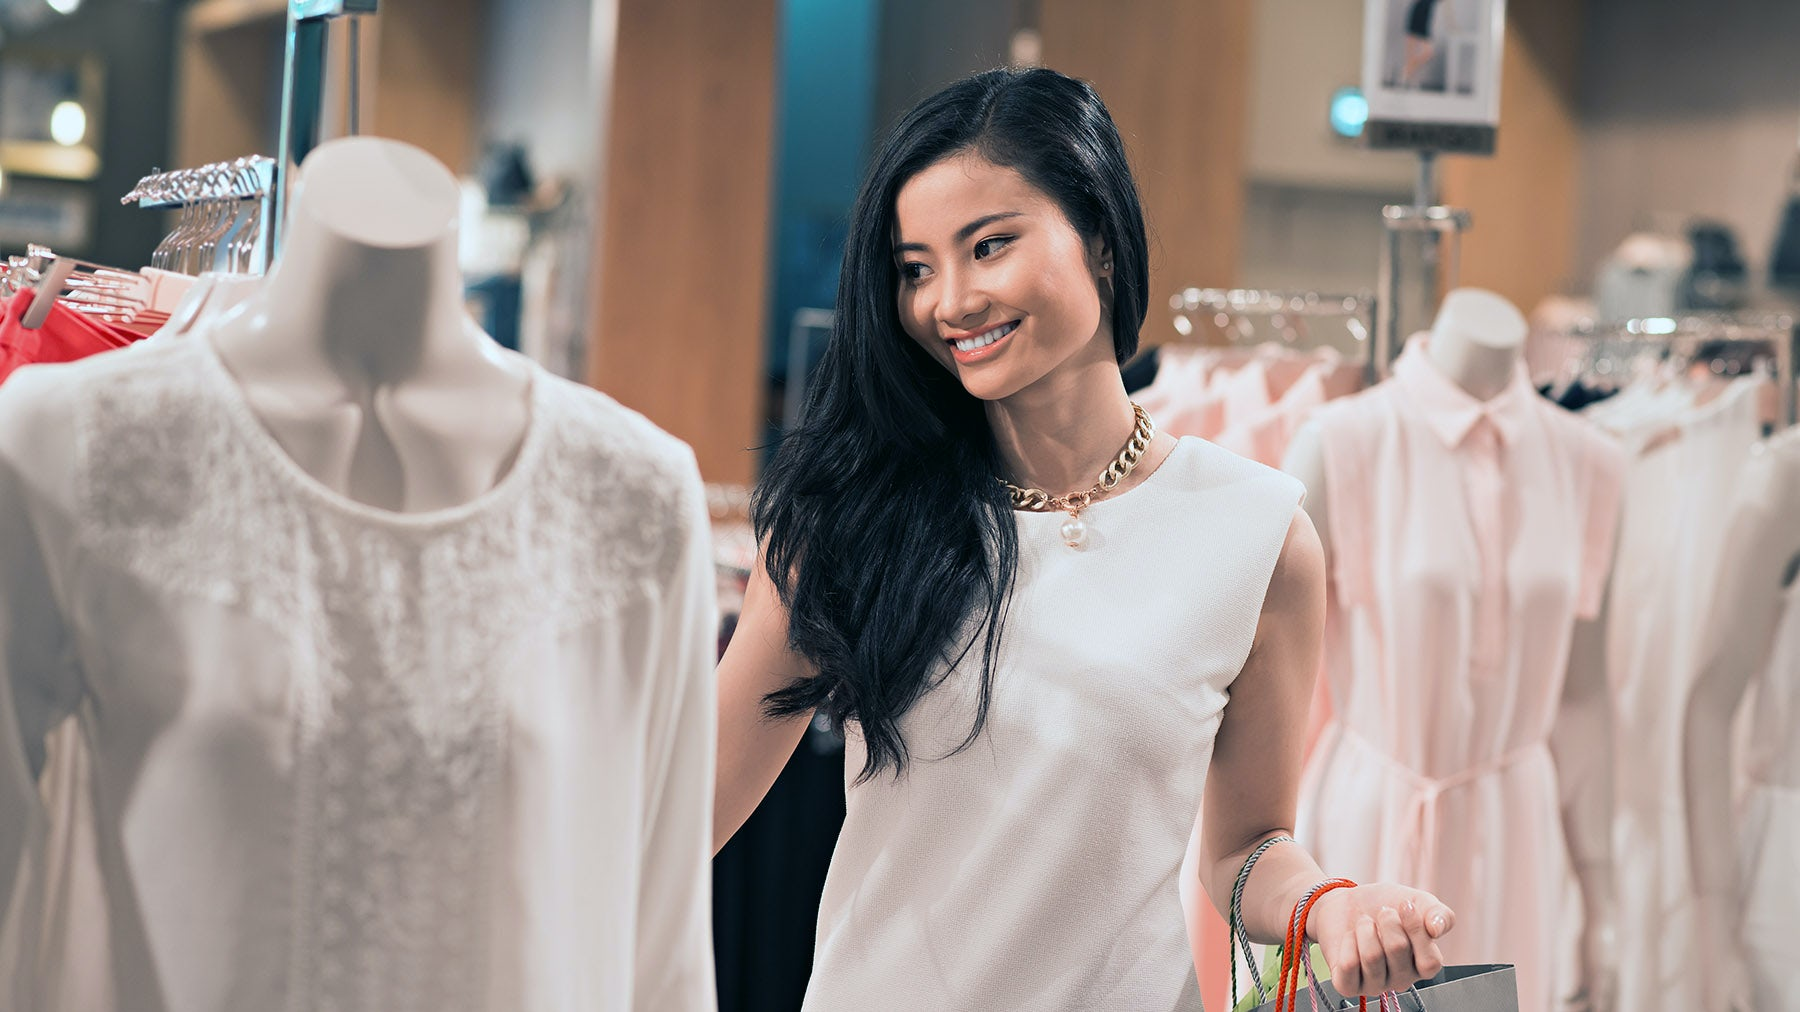 Shopper in a boutique | Source: Shutterstock